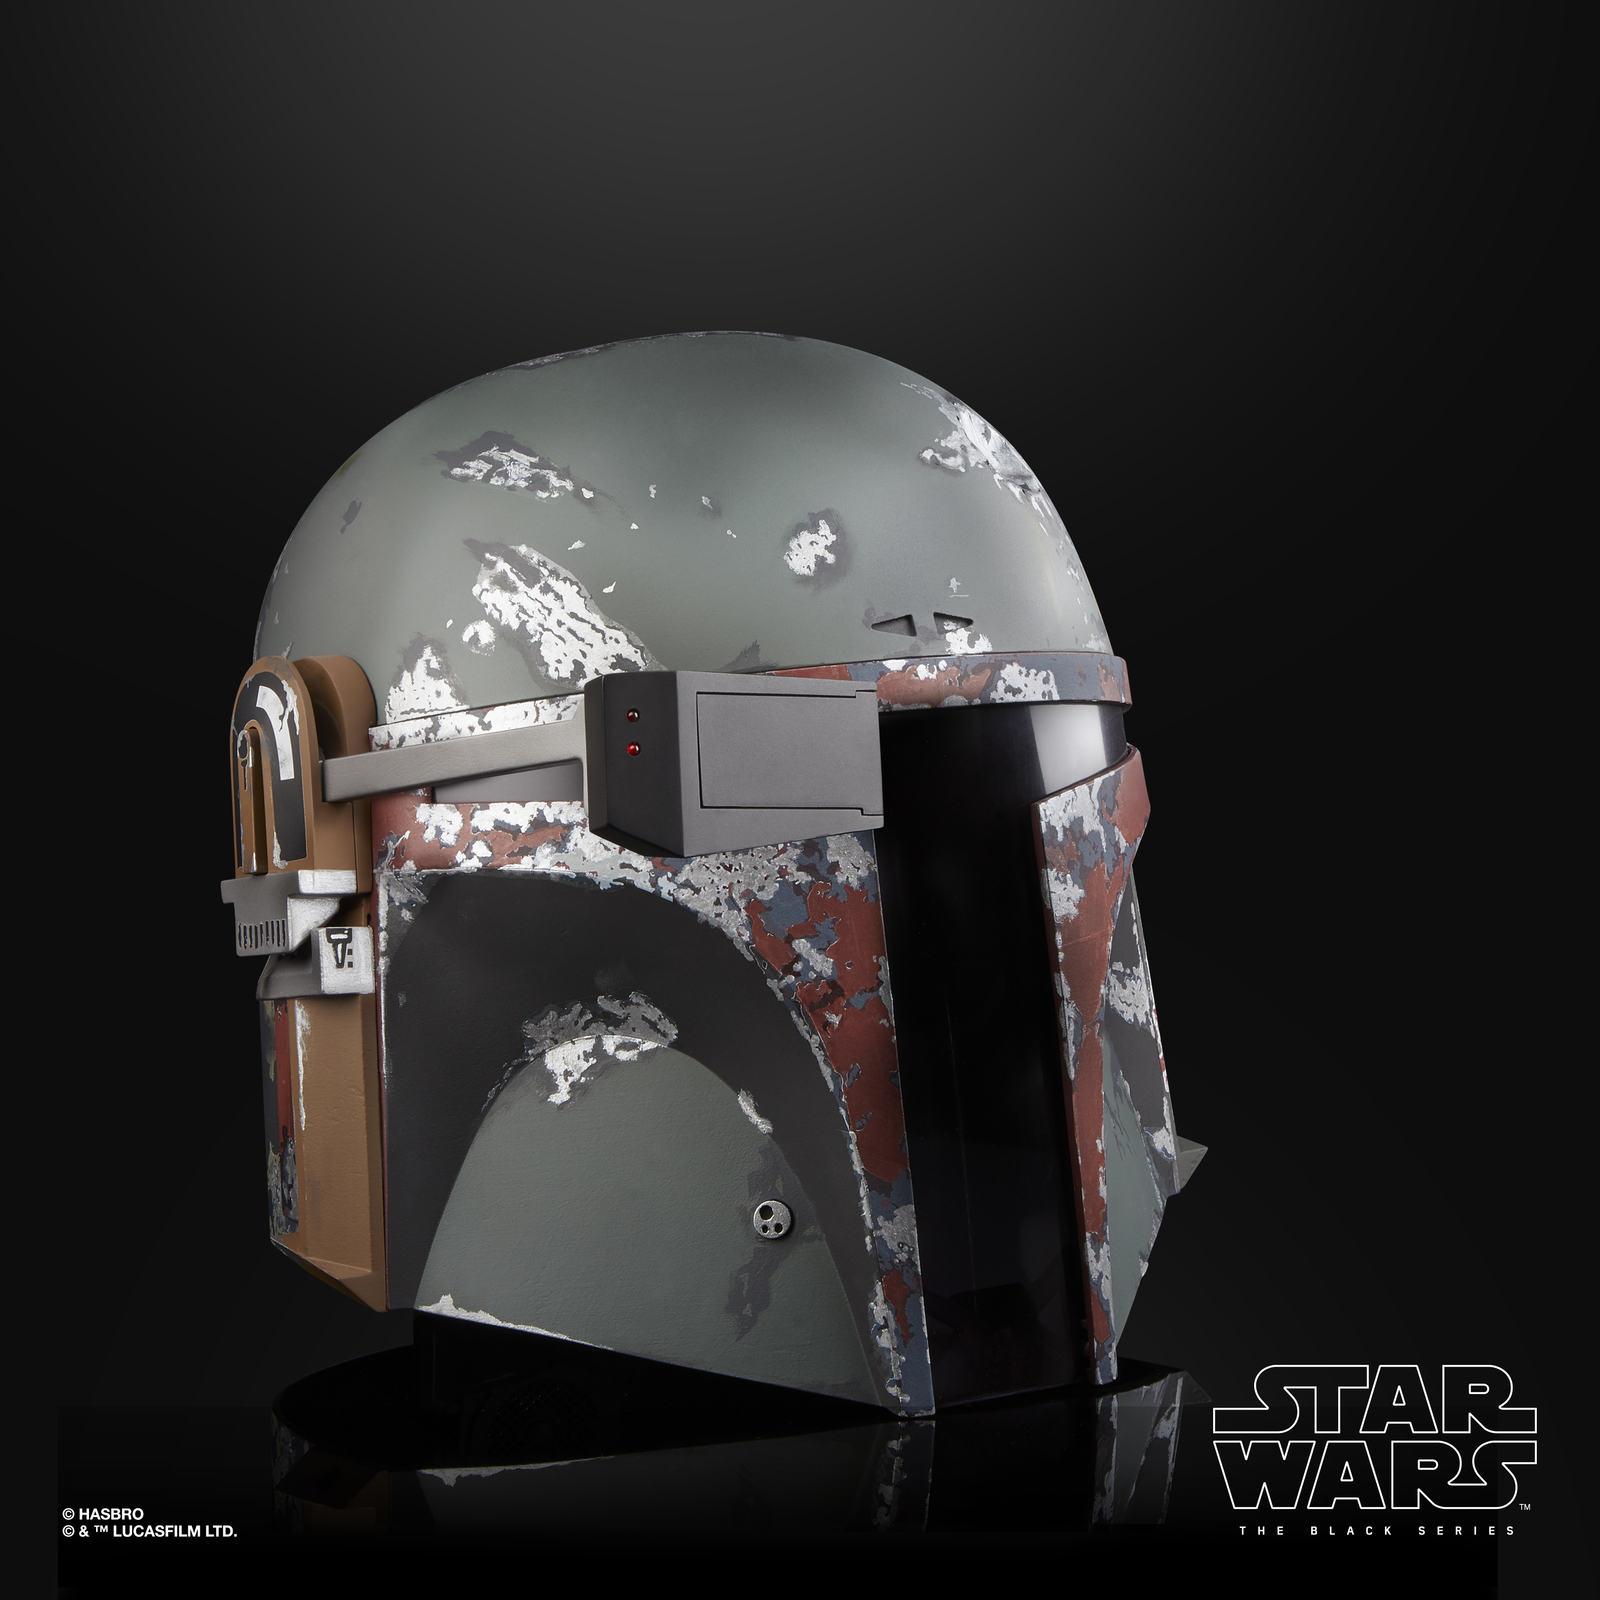 Star Wars: Black Series Helmet - Boba Fett image